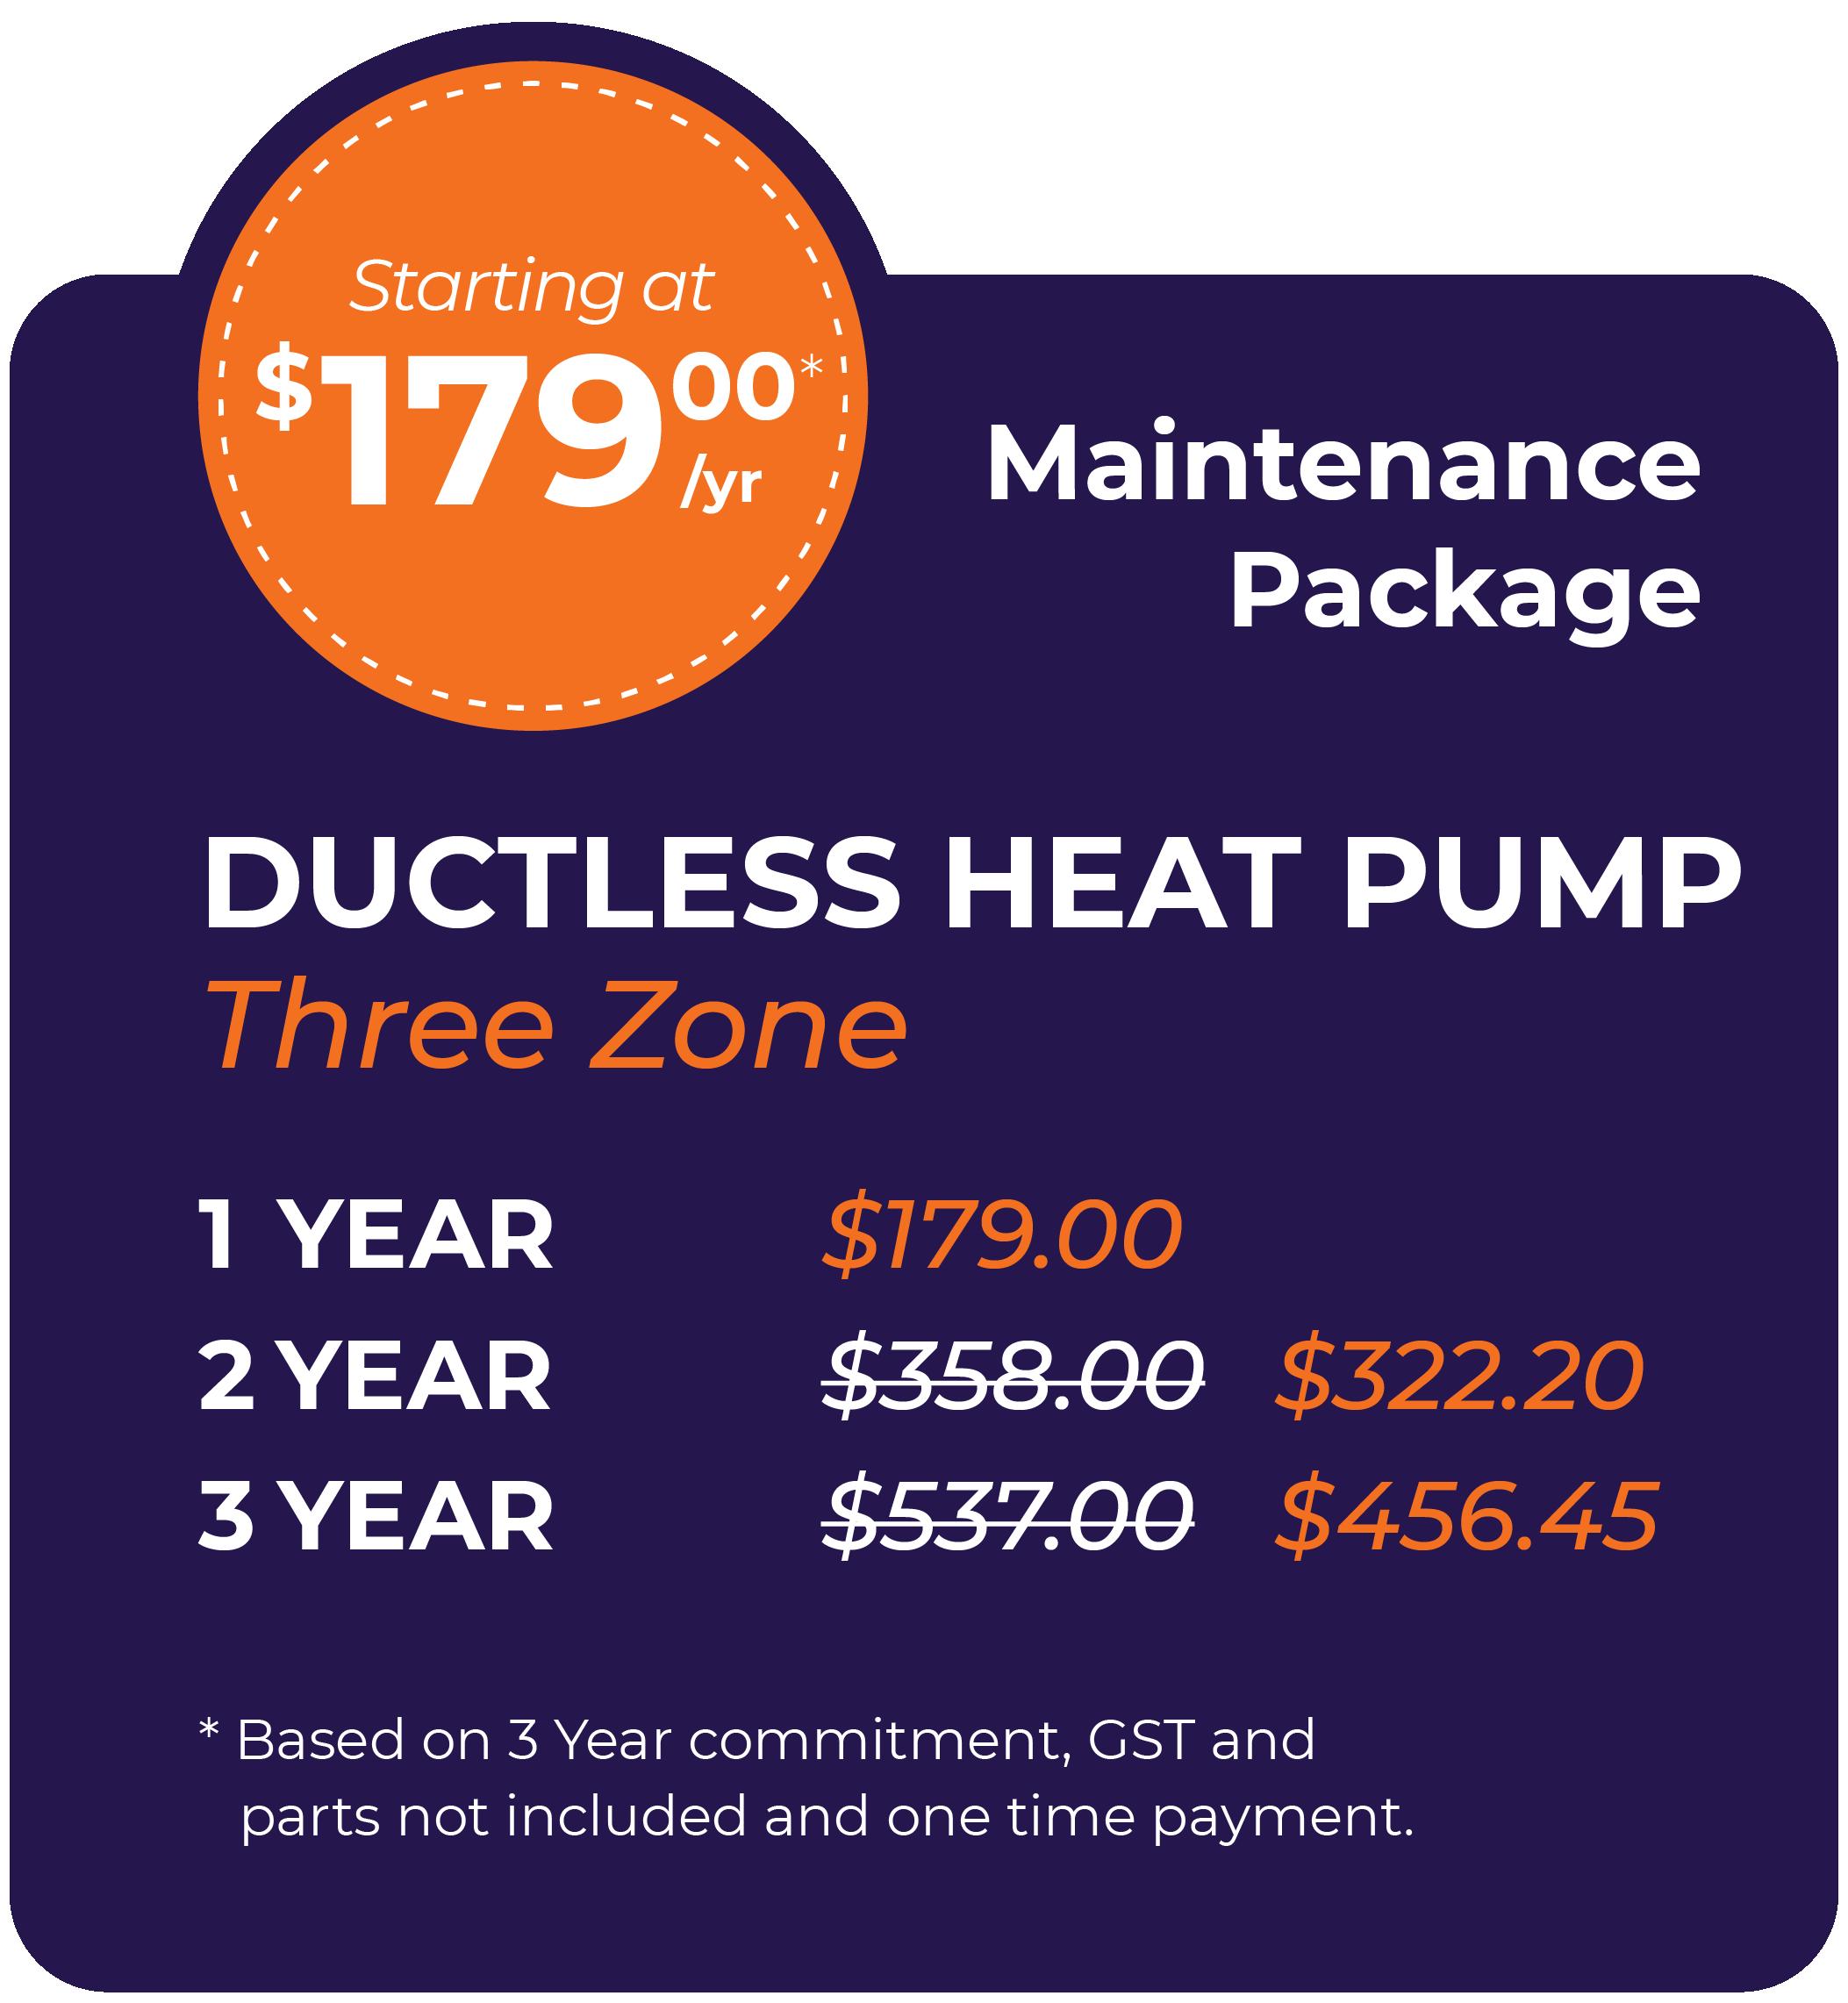 Ductless Heat Pump Three Zone Maintenance Package